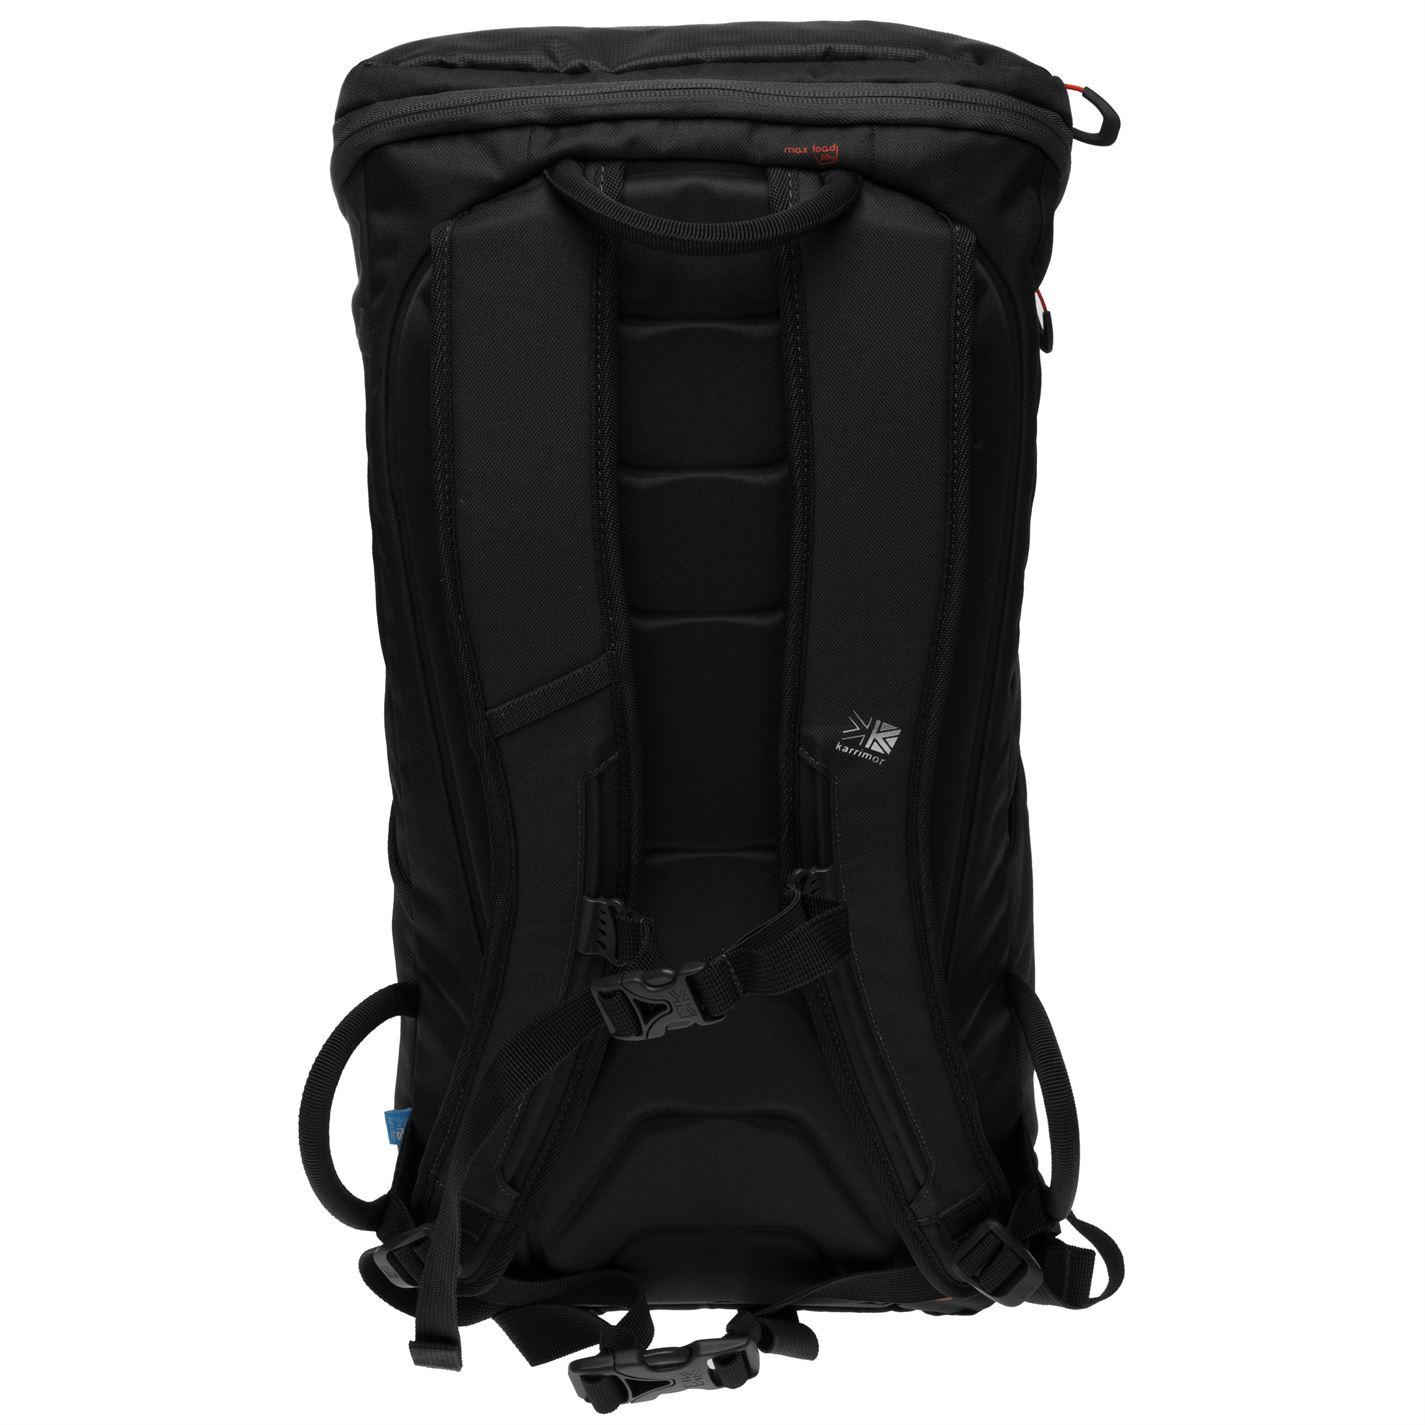 50L Outdoor Trekking Backpack Bag Camping Hiking Travel Bag Military Tactical